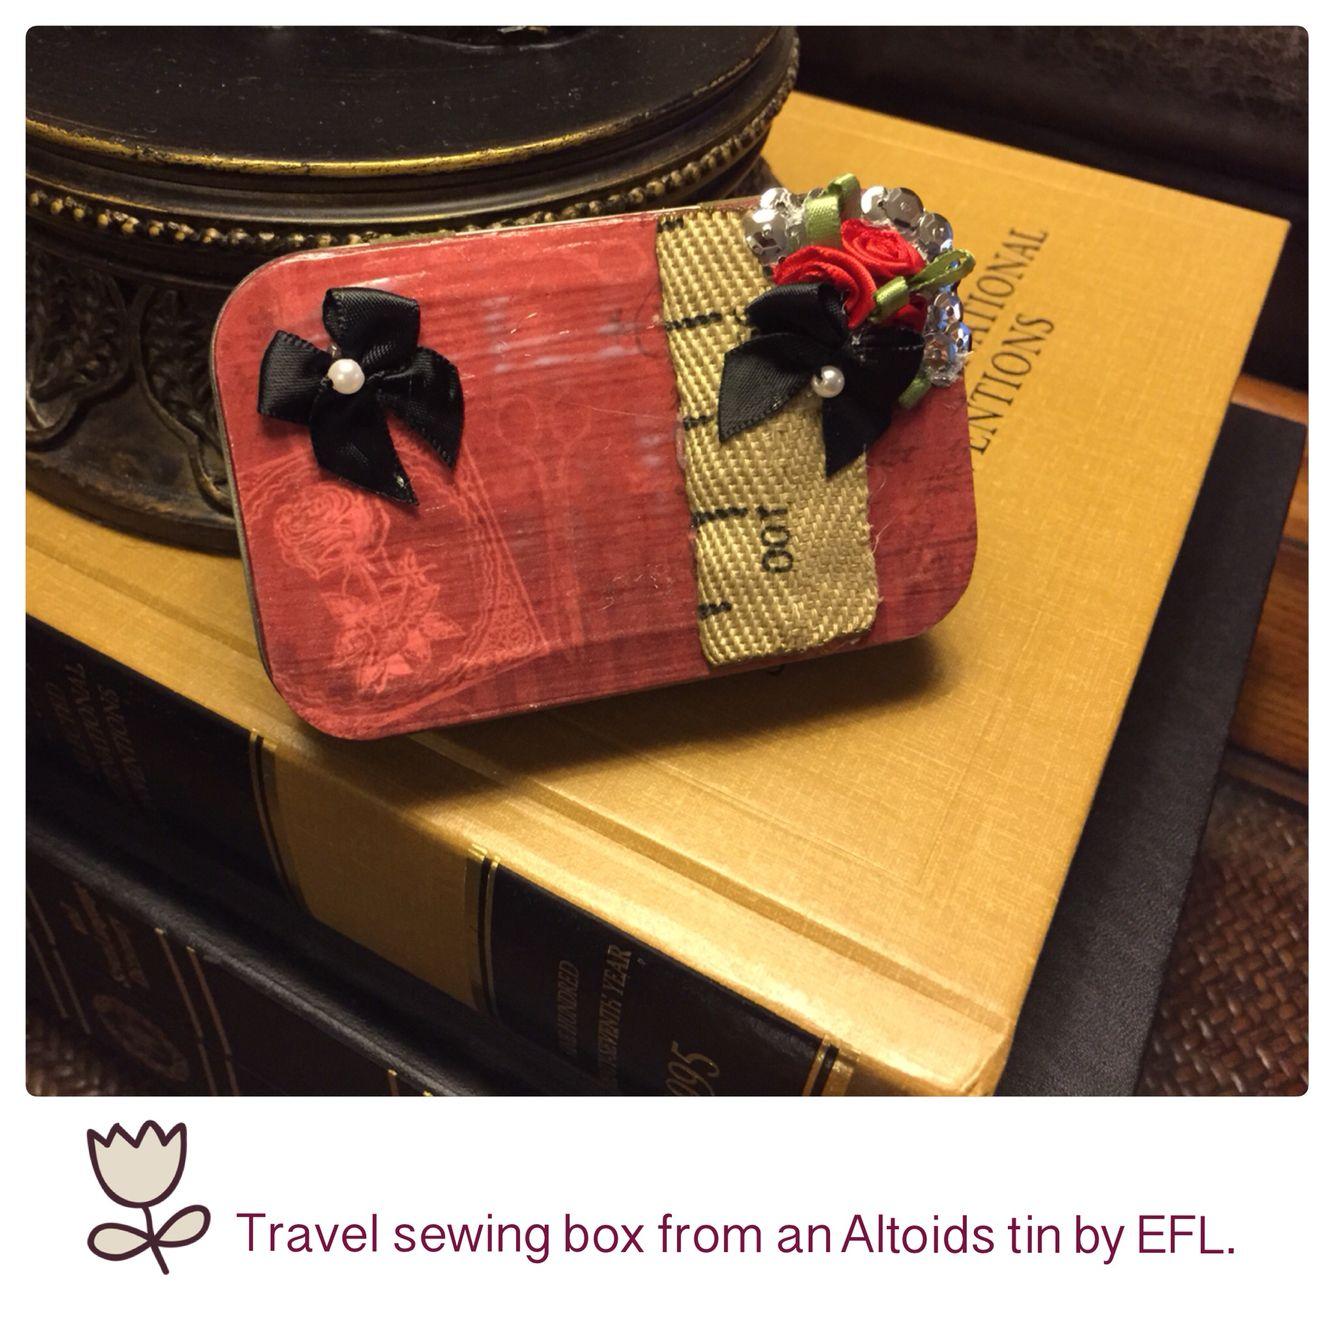 My DIY travel sewing box from an Altoids tin by EFL.